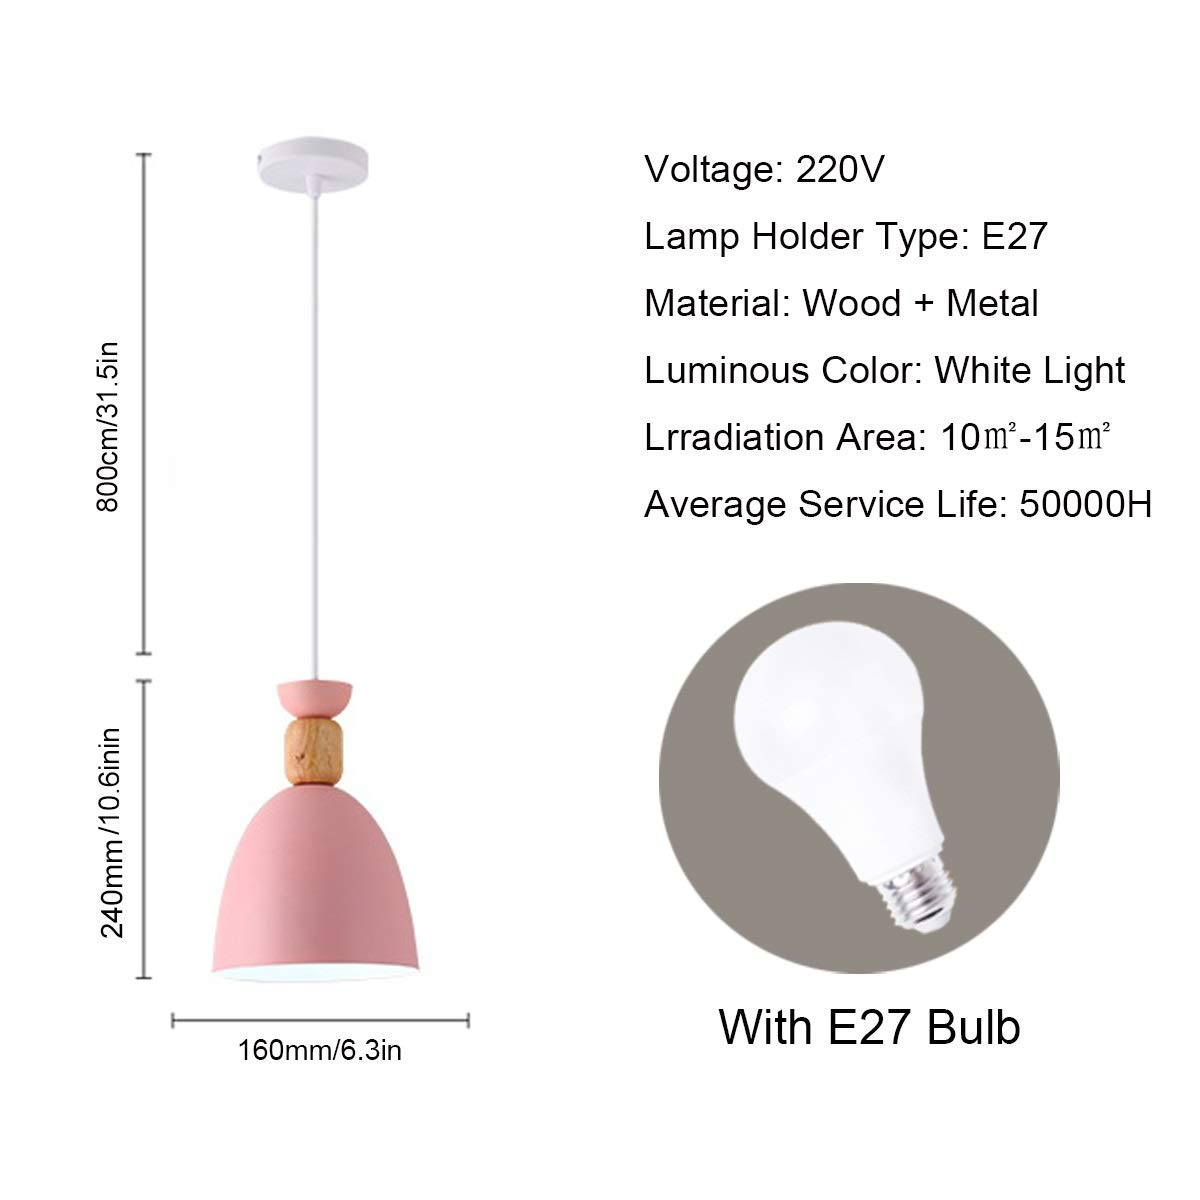 NANGE Macaron Chandelier, Wood Metal Suction Cups Pendant Lighting,Restaurant Home Dining Table Hanging Lamp,E27,110-220V(Without Light Source) (Color : Pink, Size : AC 220V) by NANGE (Image #2)